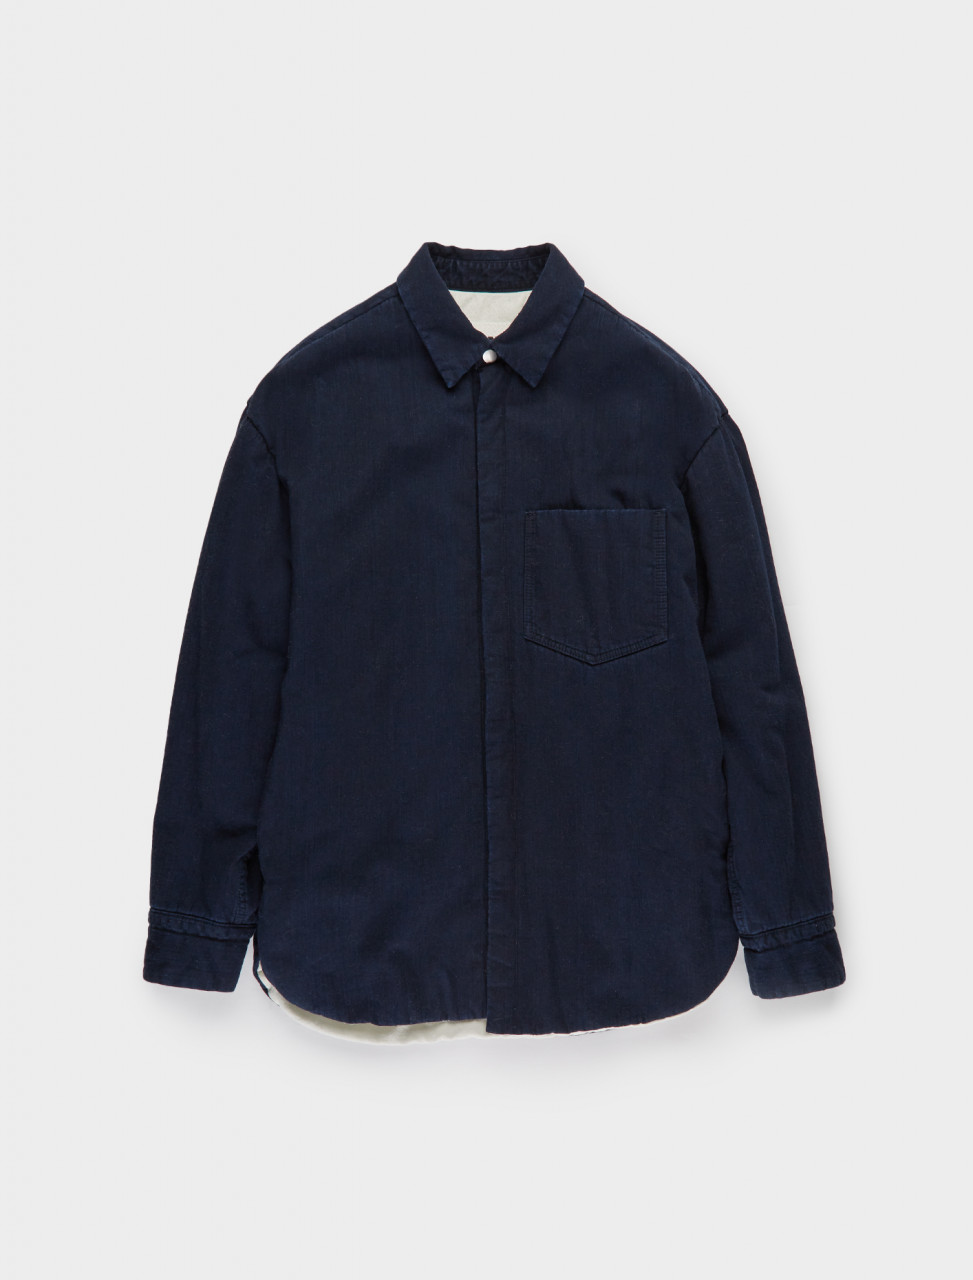 130-JPUR667430-MR246100-402 JIL SANDER Padded Shirt in Dark Blue